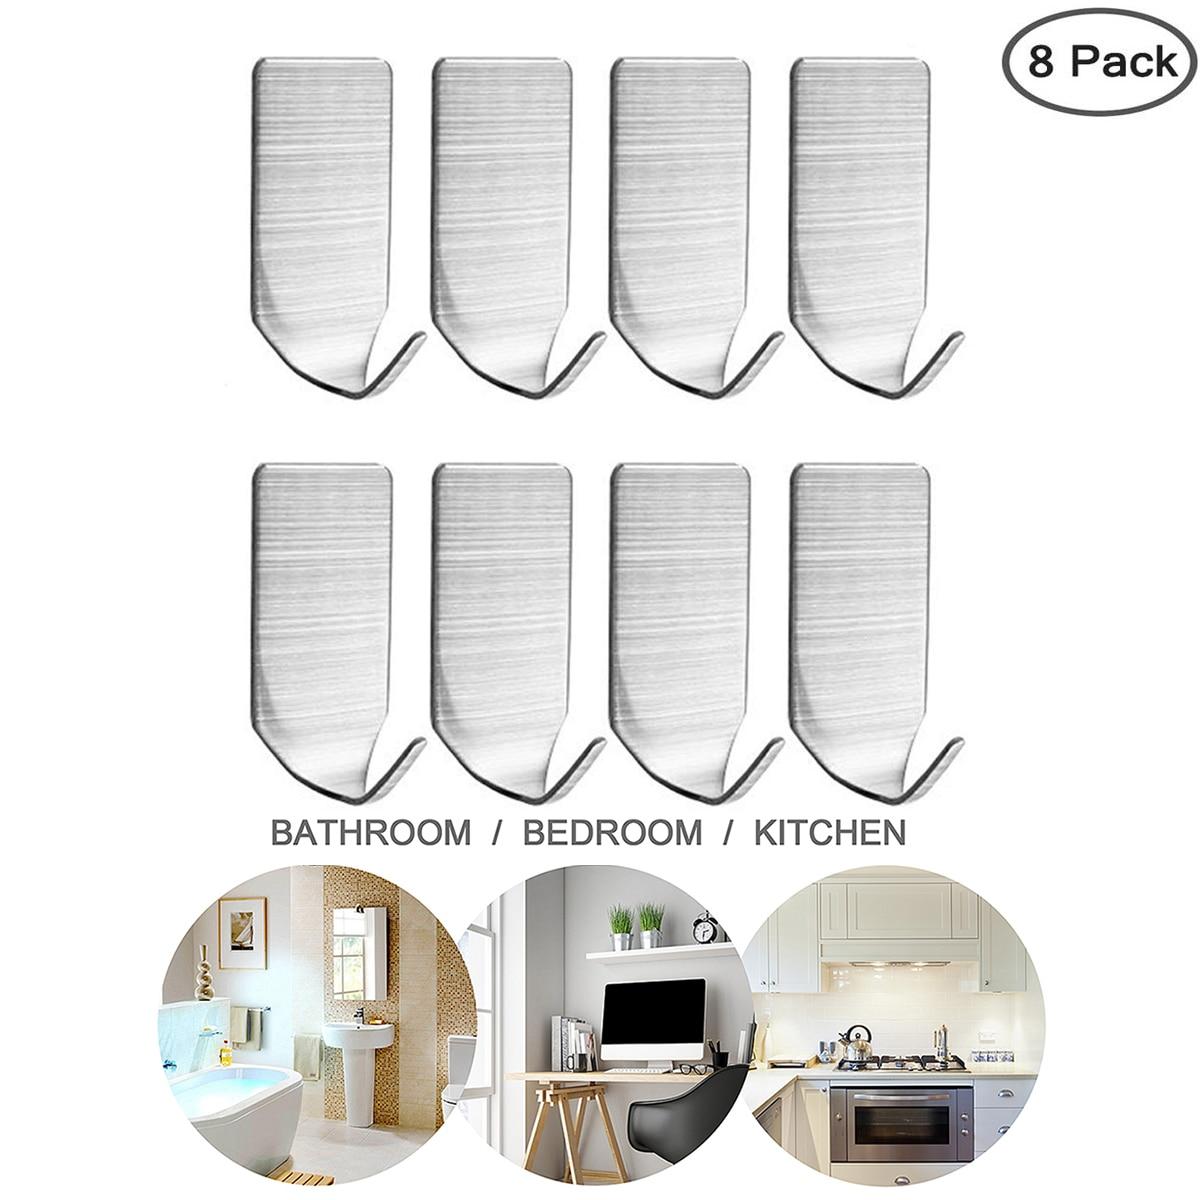 8 16 Pcs Self Adhesive Hooks Stainless Steel 3M Adhesive Wall Rust Proof Hanger For Robe Coat Towel Keys Bags Kitchen Bathroom